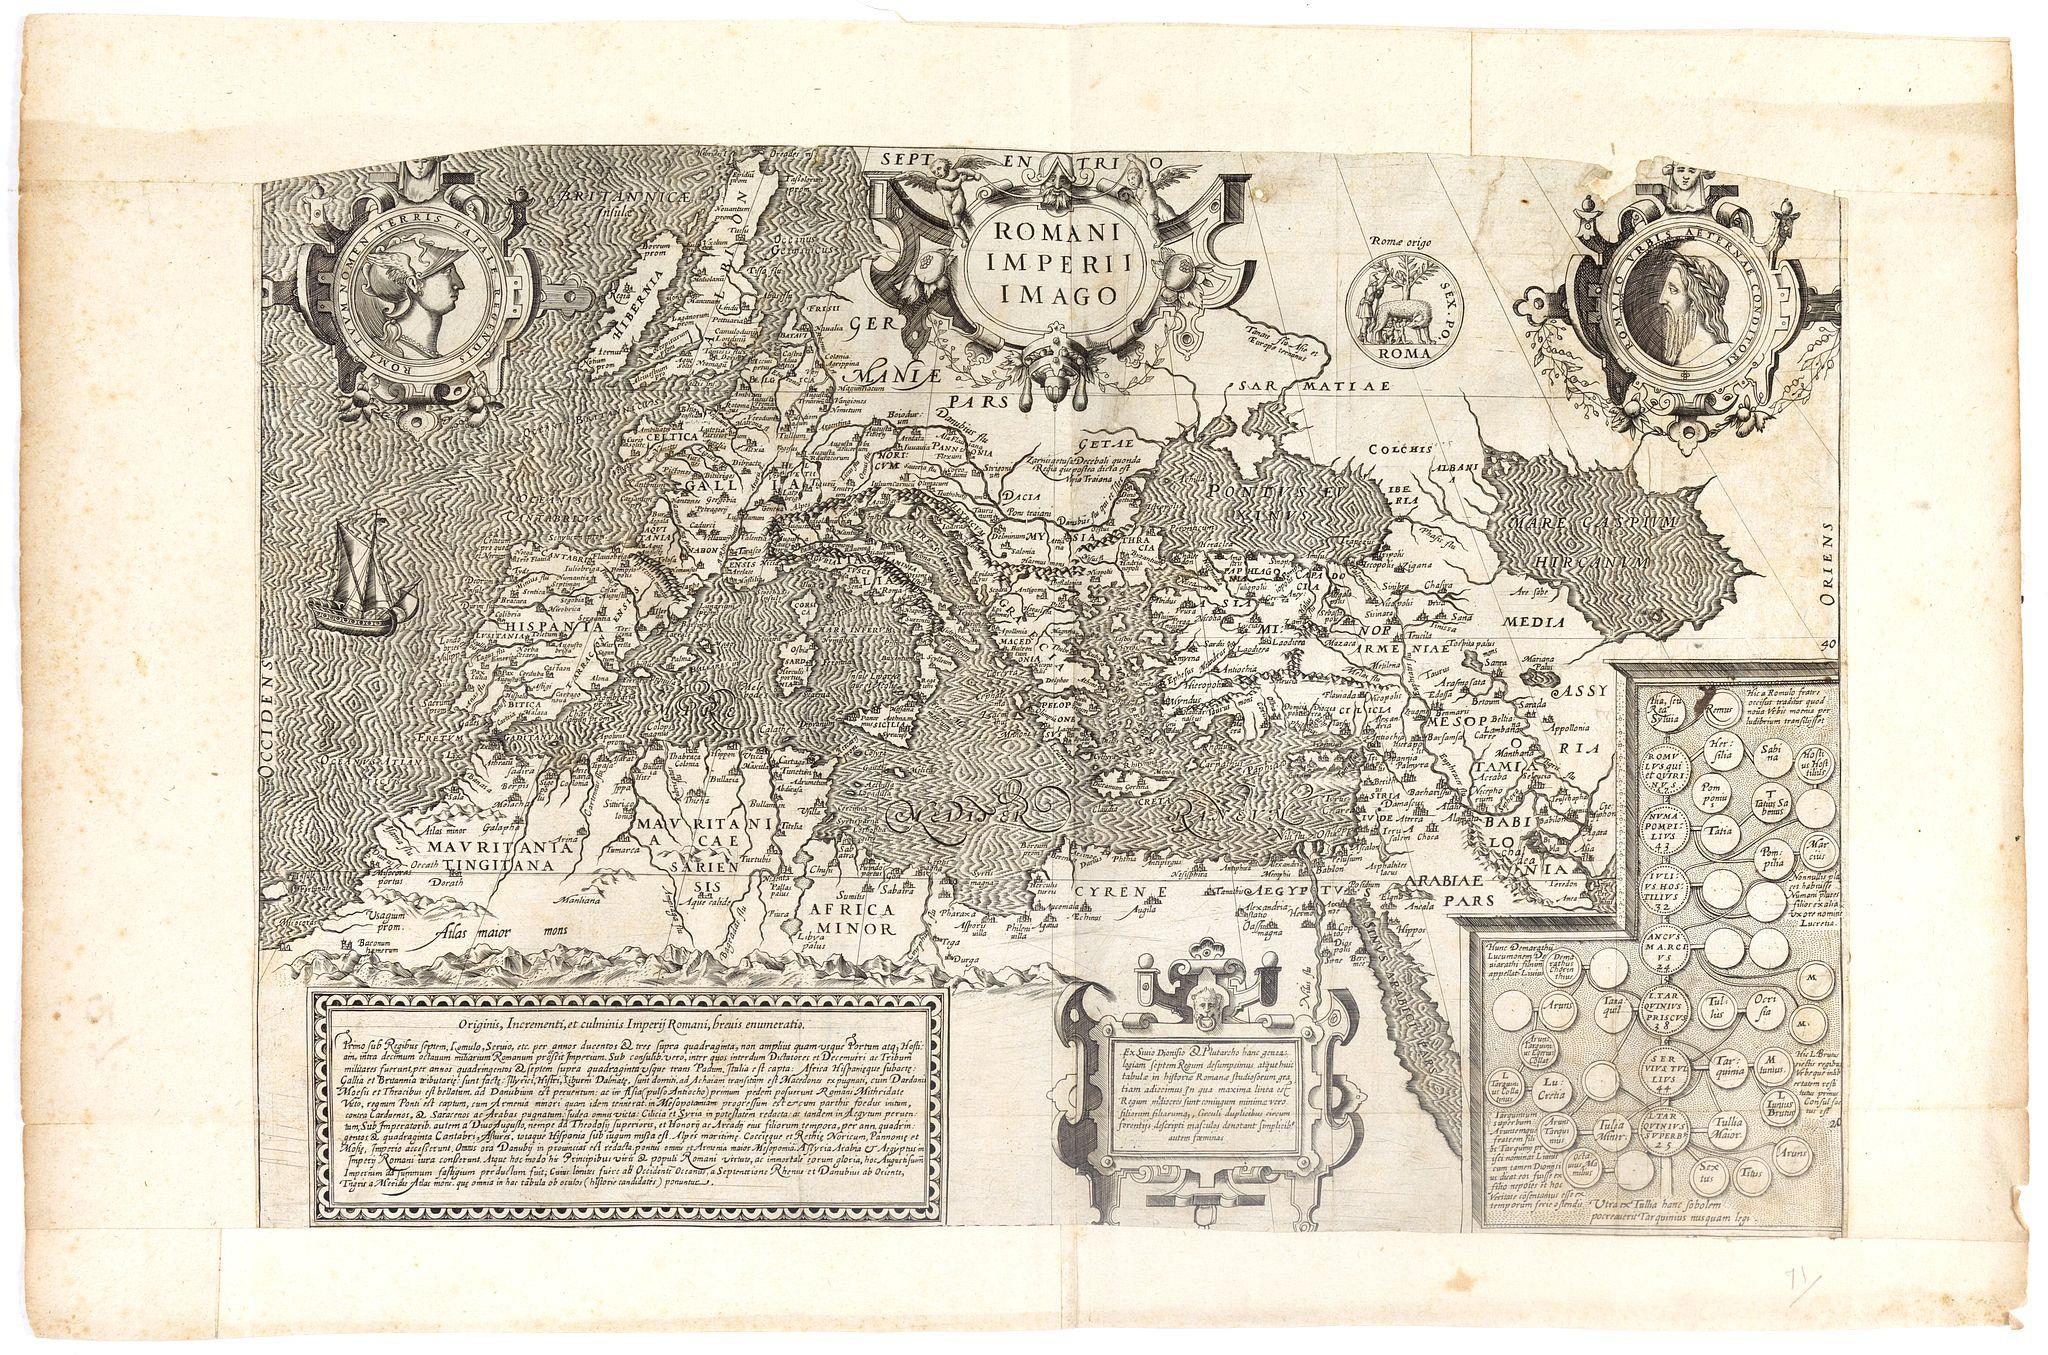 HONERVOGT, J. -  Romani Imperii Imago.